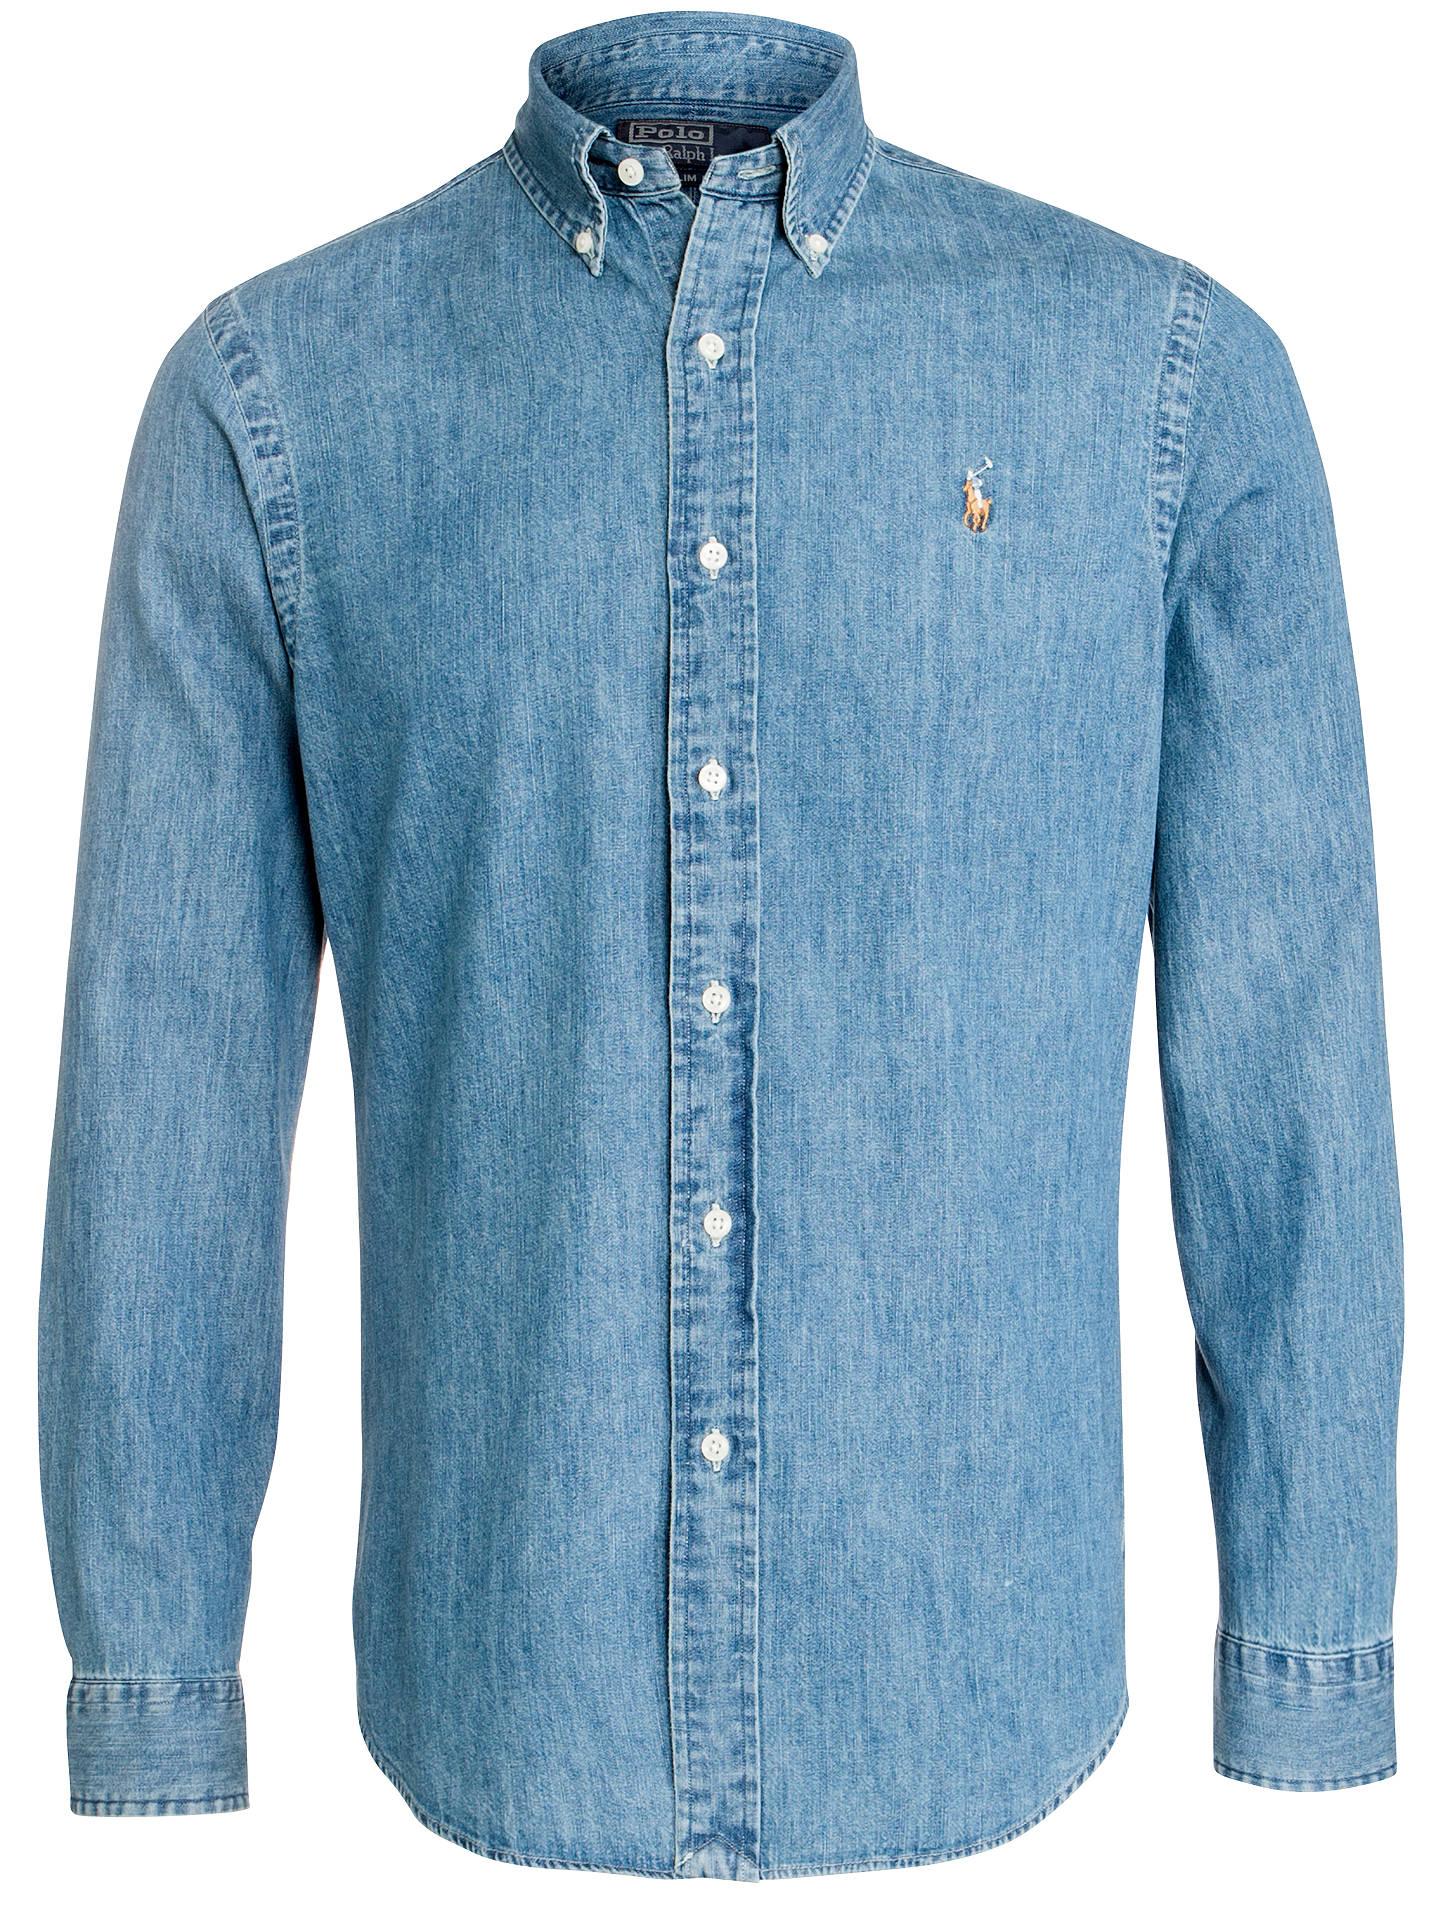 12e9327ba6f Buy Polo Ralph Lauren Slim Fit Denim Shirt